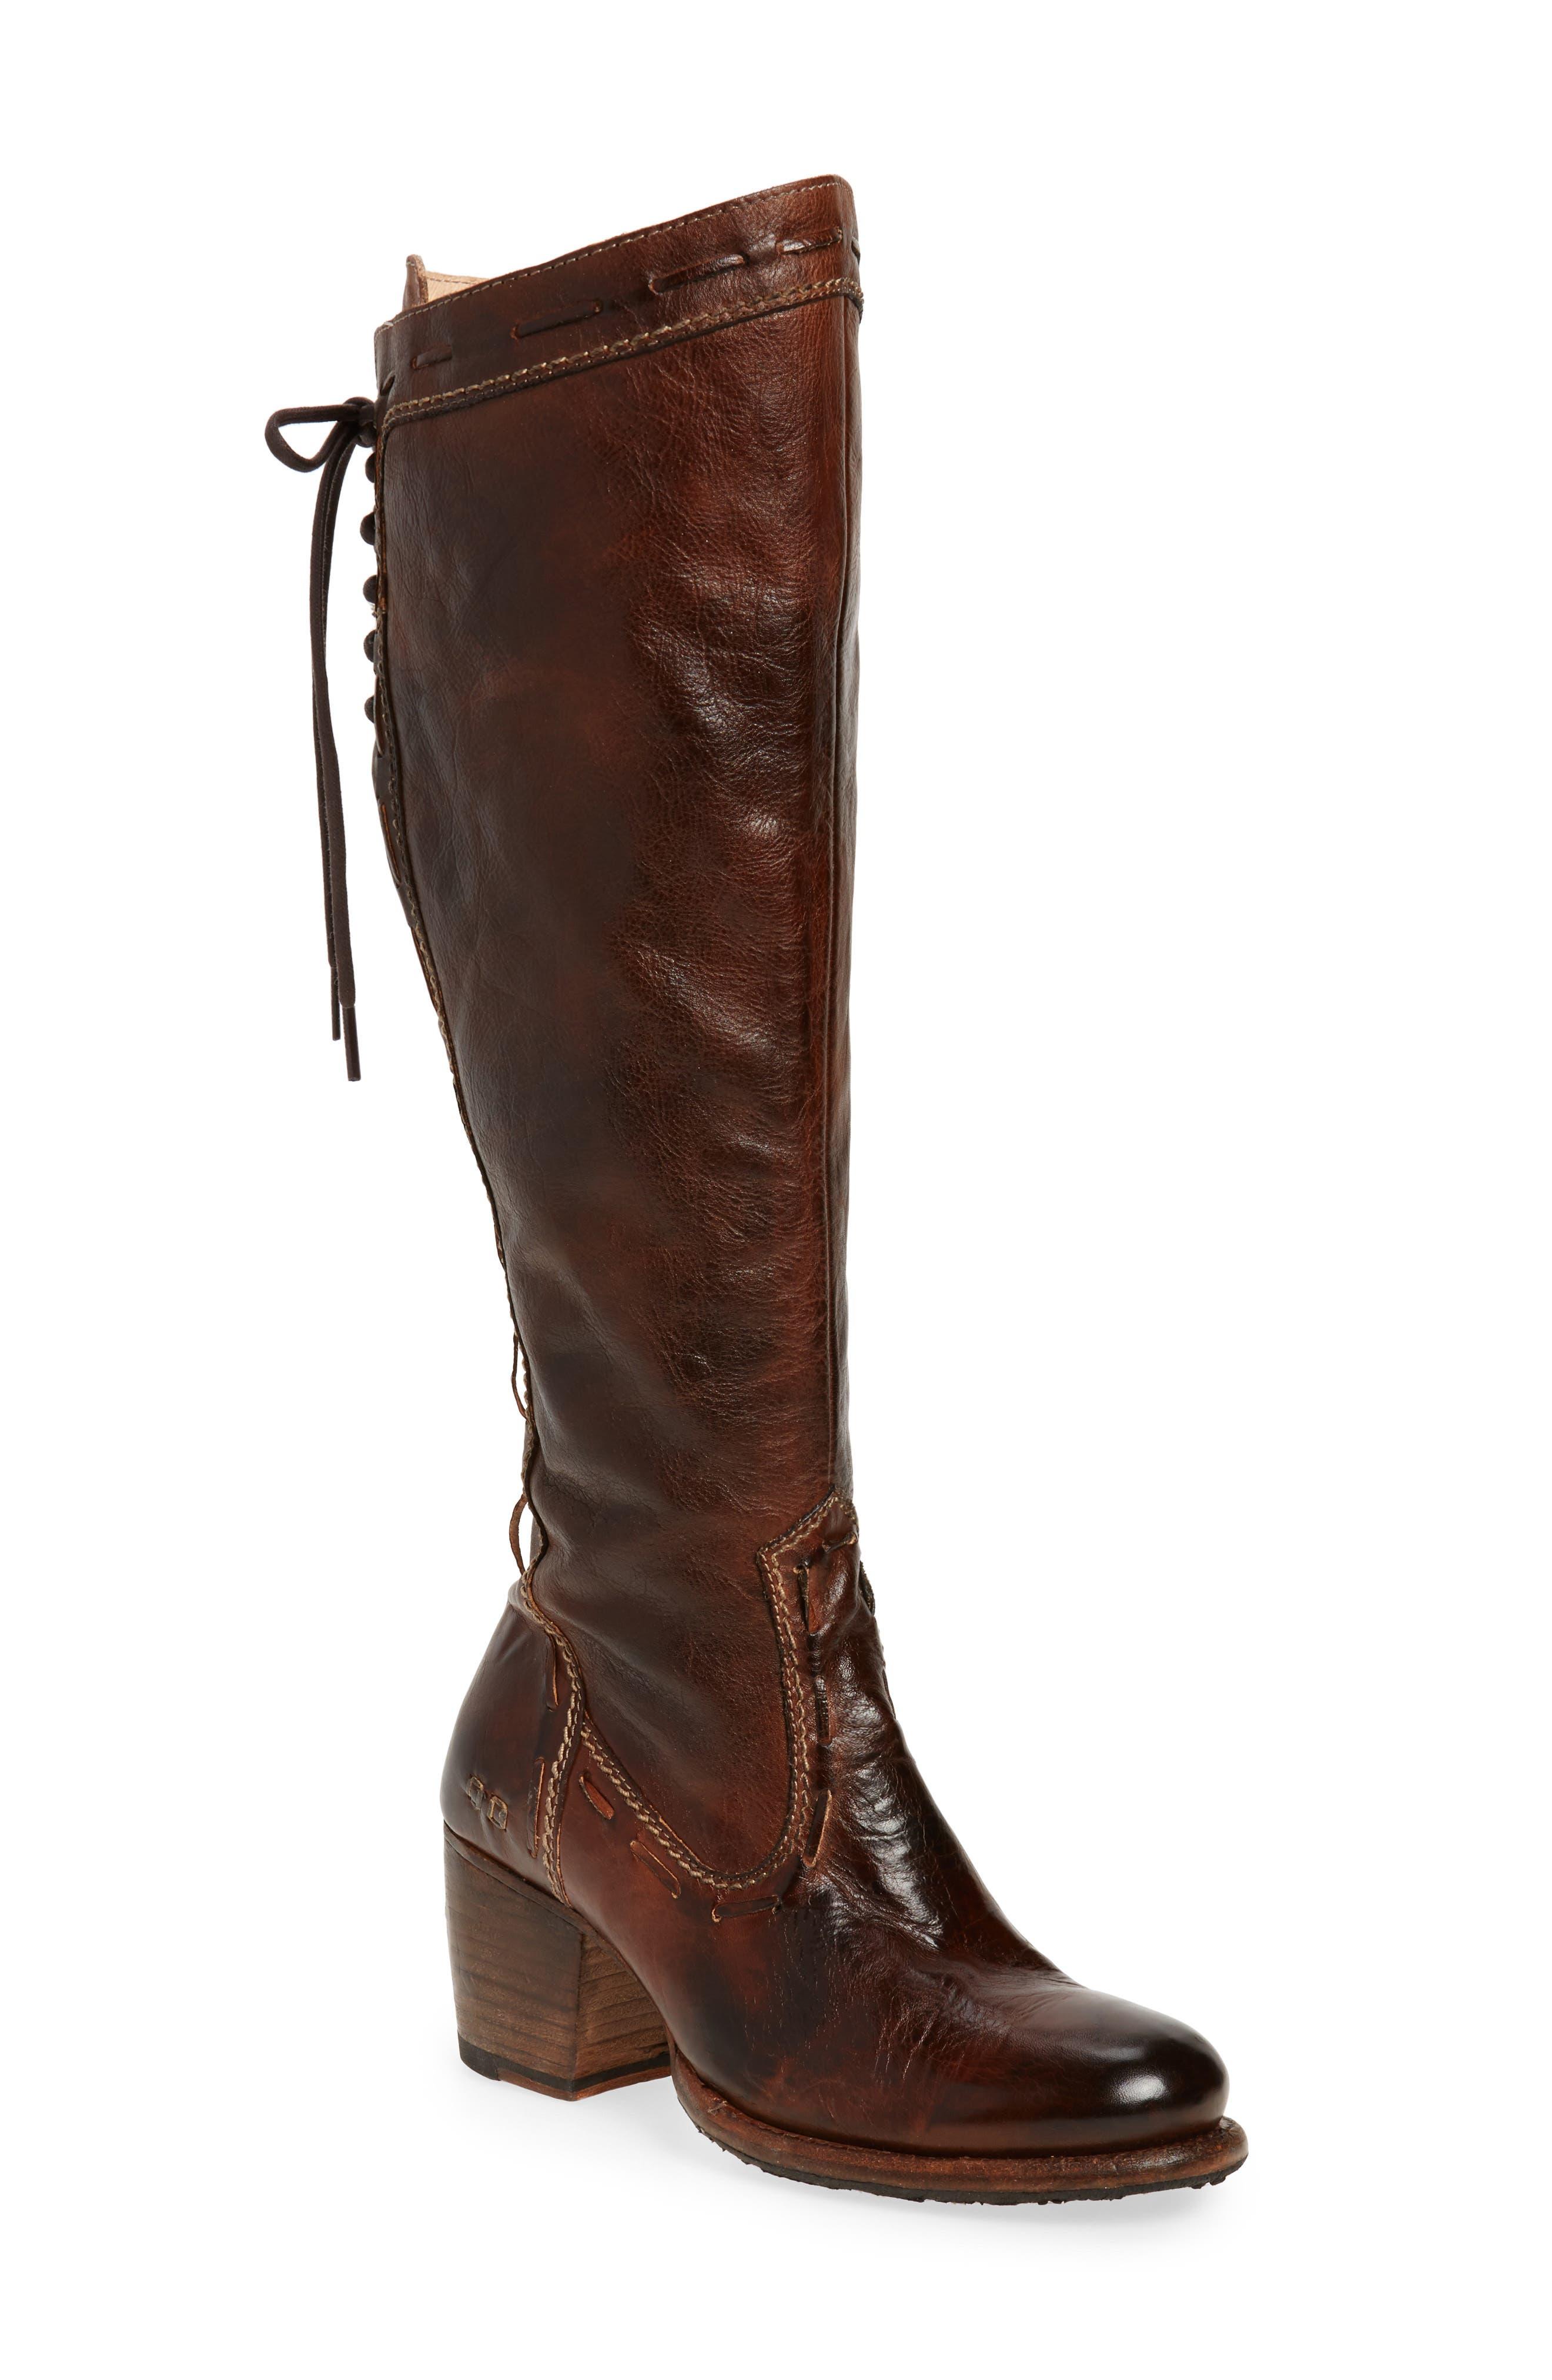 Main Image - Bed Stu Fortune Knee High Boot (Women)